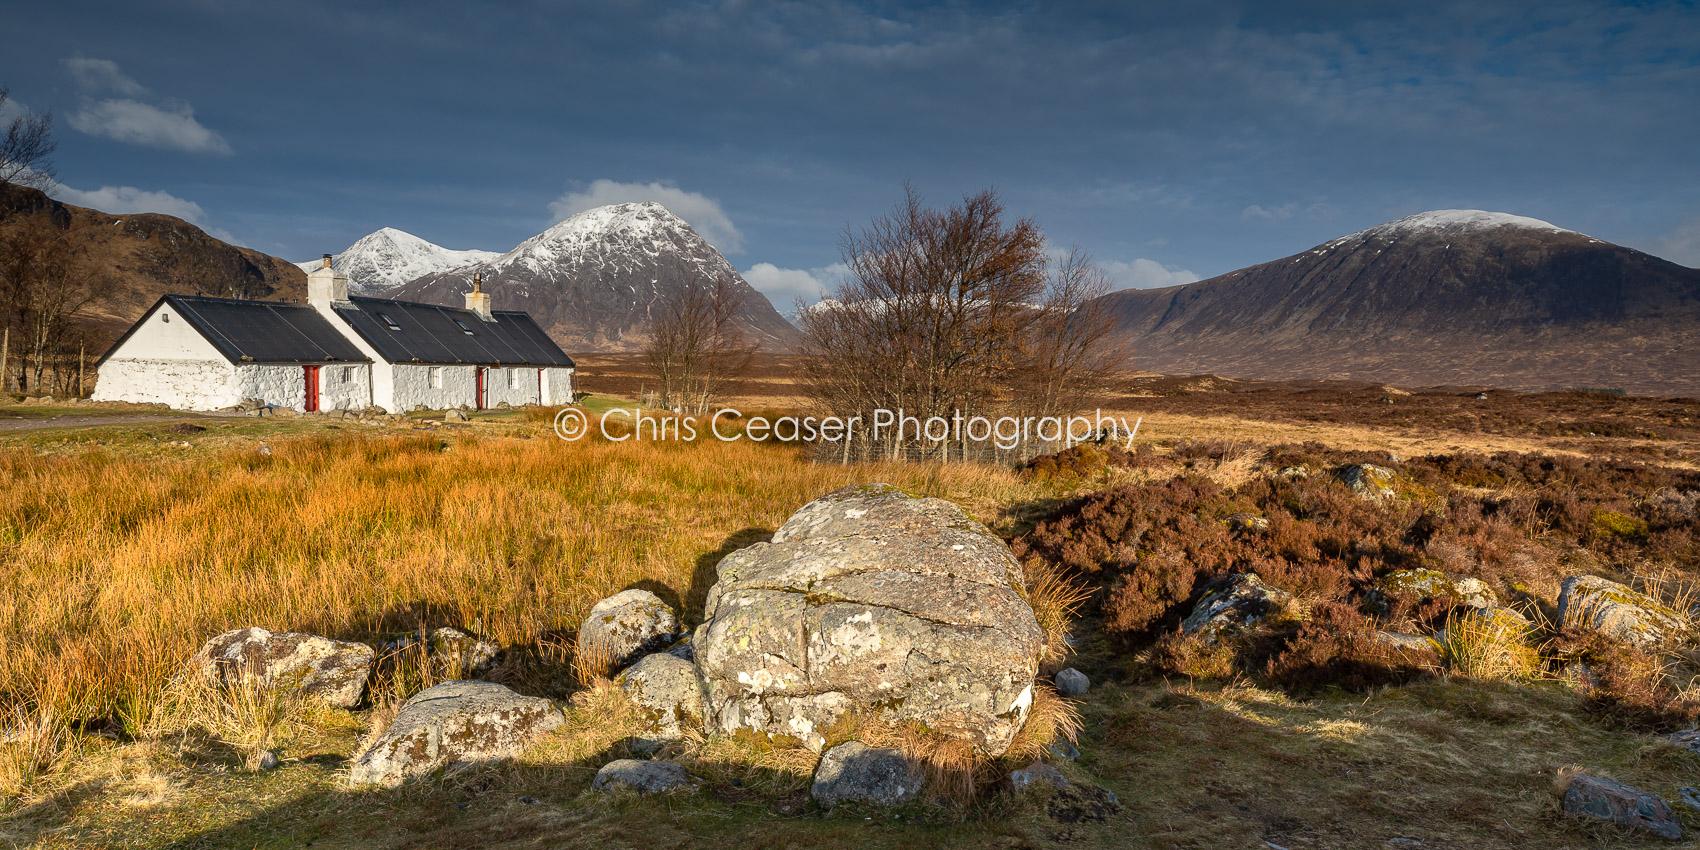 Bursting Through, Black Rock Cottage